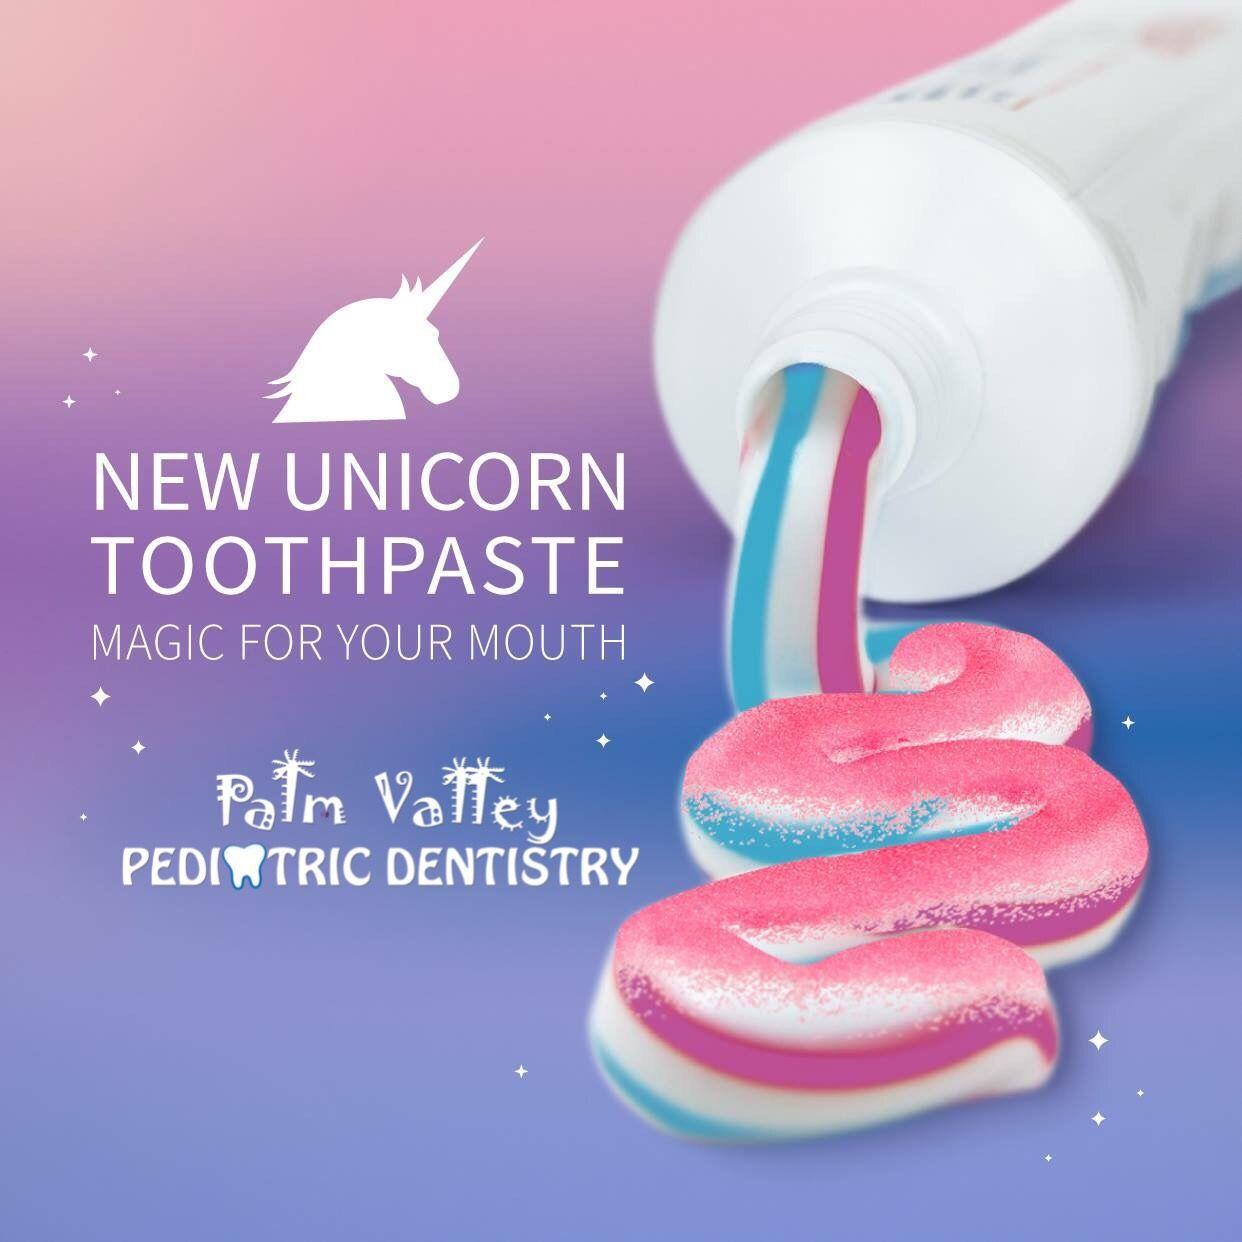 Palm Valley Pediatric Dentistry No Cavity Club www.pvpd